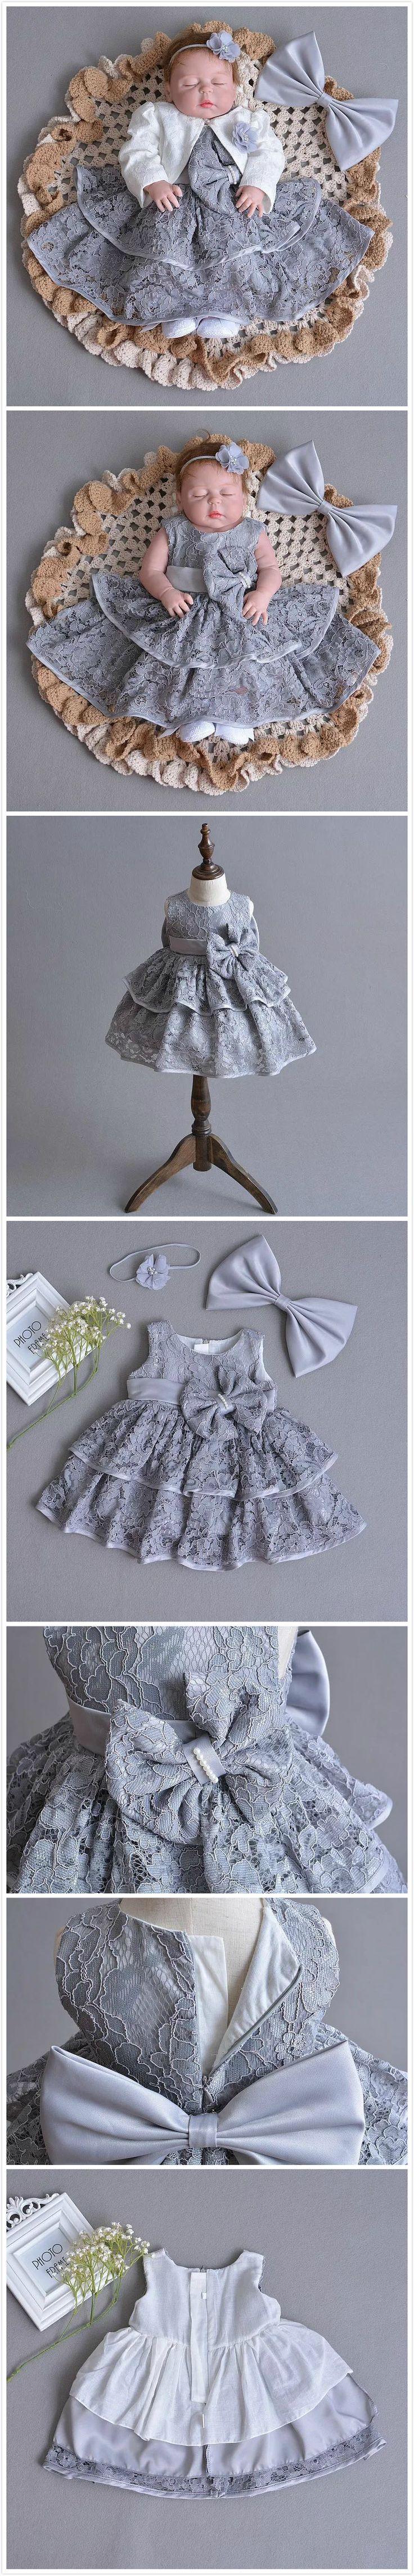 Baby & Toddler's Girl Grey Lace Dress Princess Dress Set For Wedding